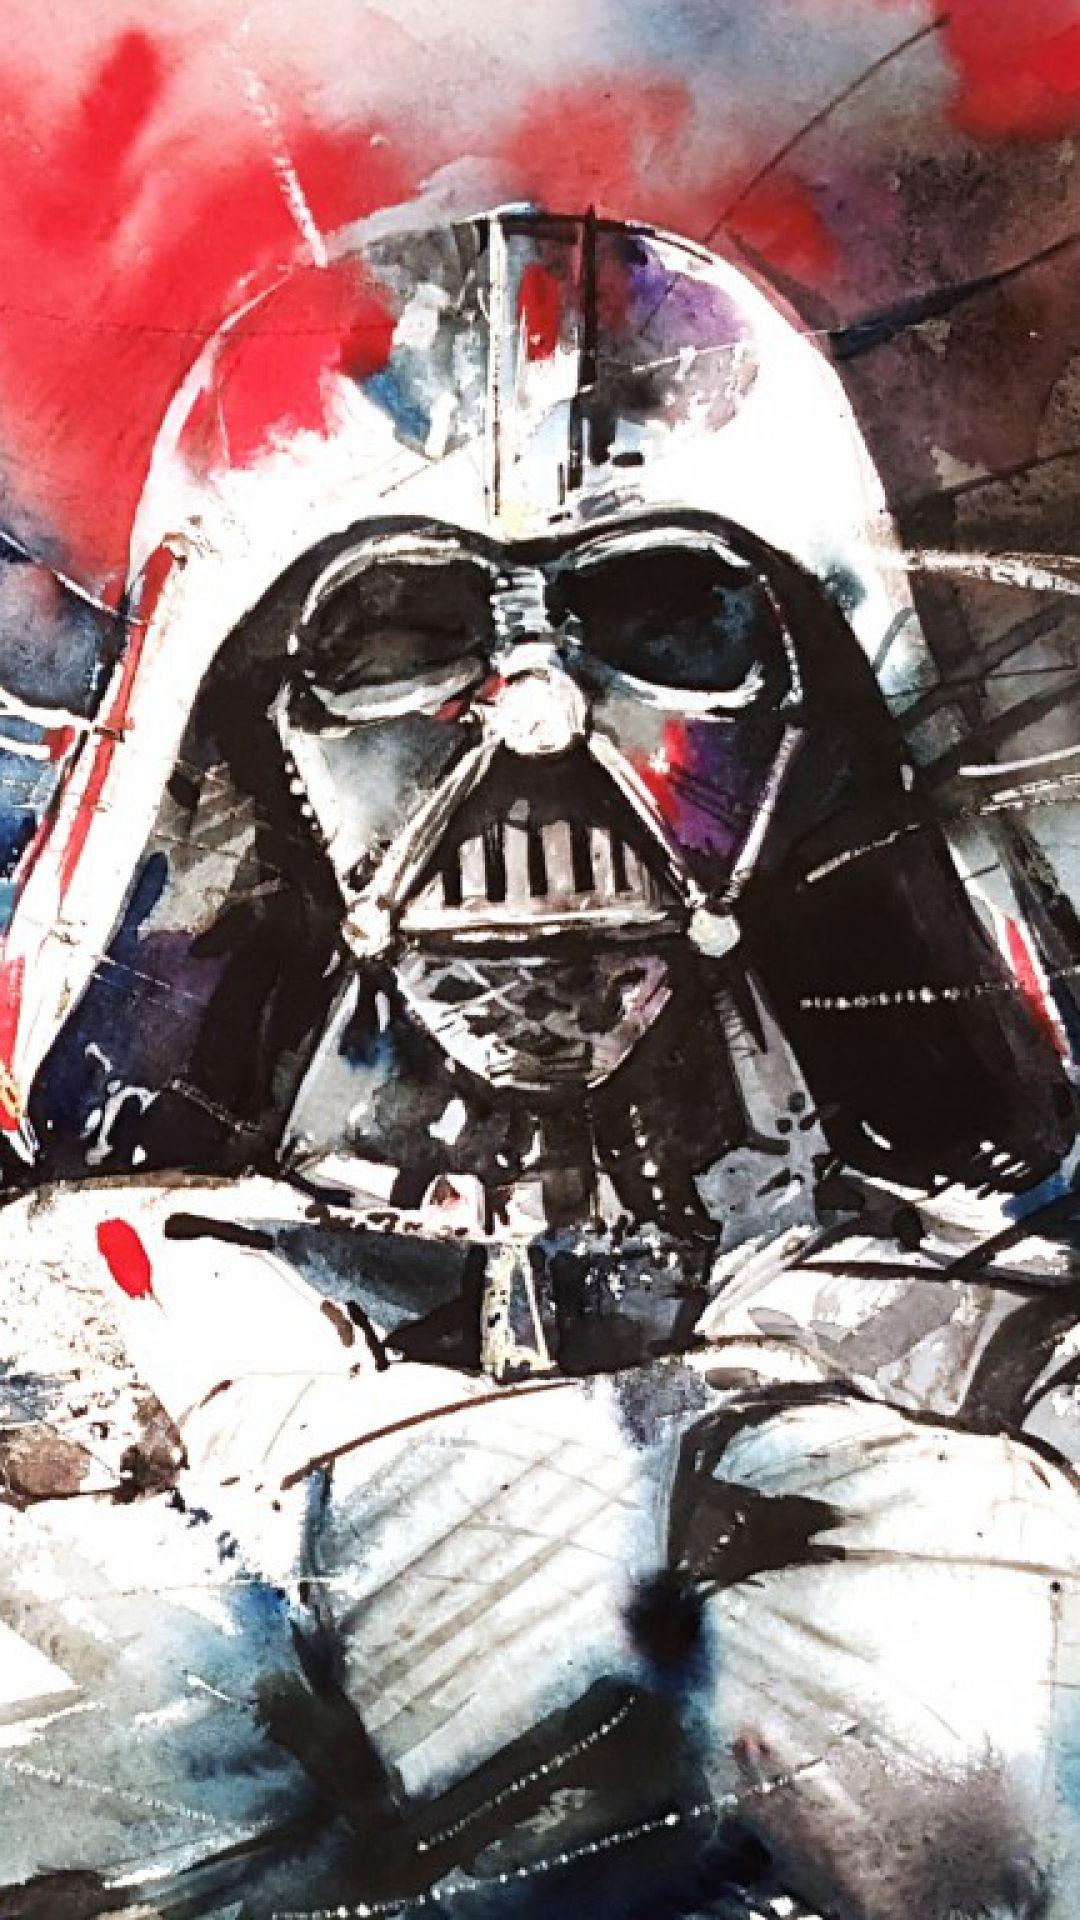 Darth Vader Star Wars Abstraction Tap to see more